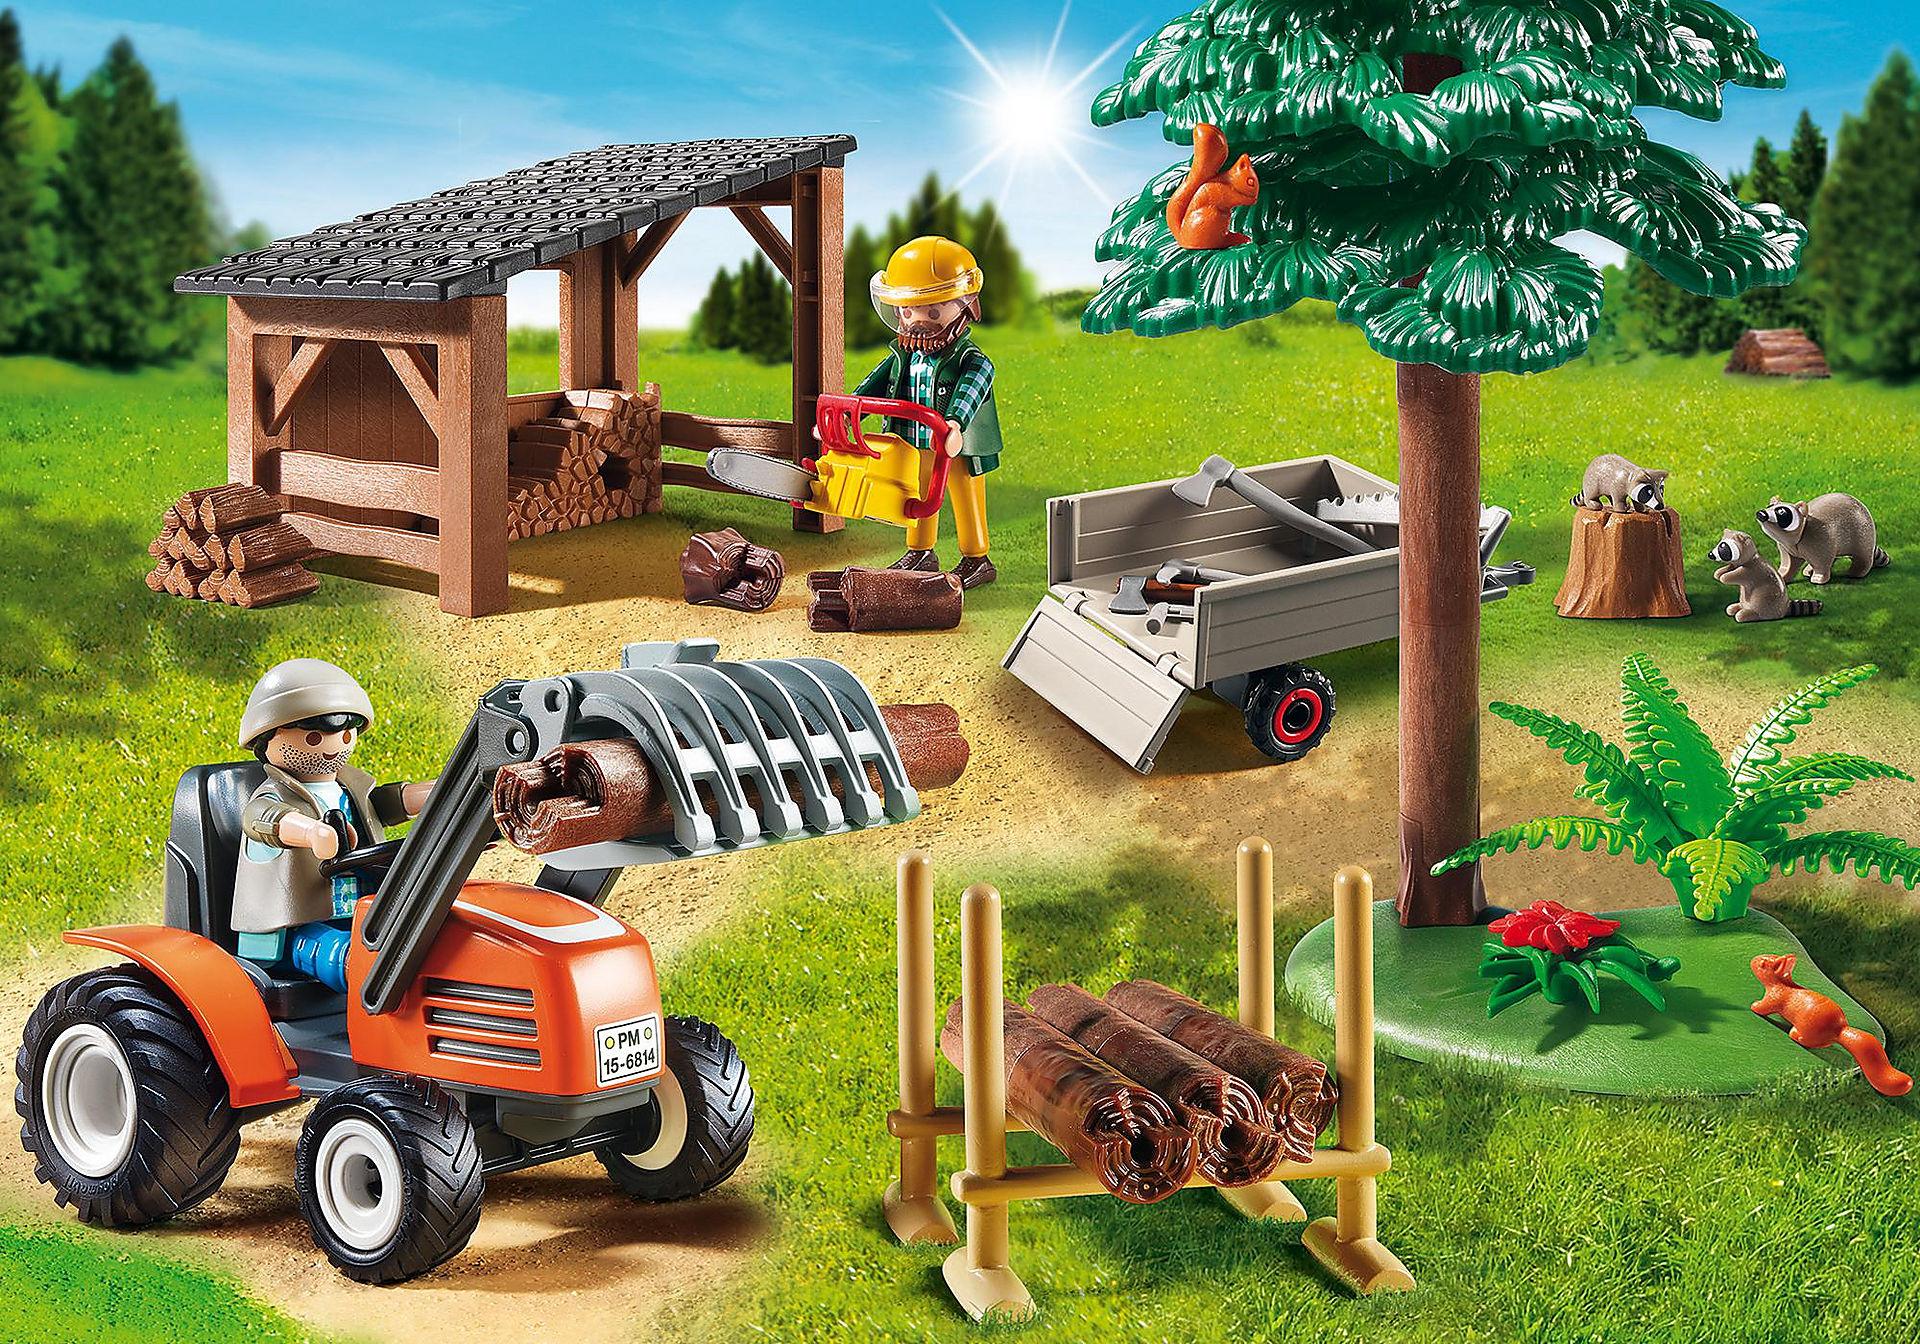 6814 Houthakker met tractor zoom image1